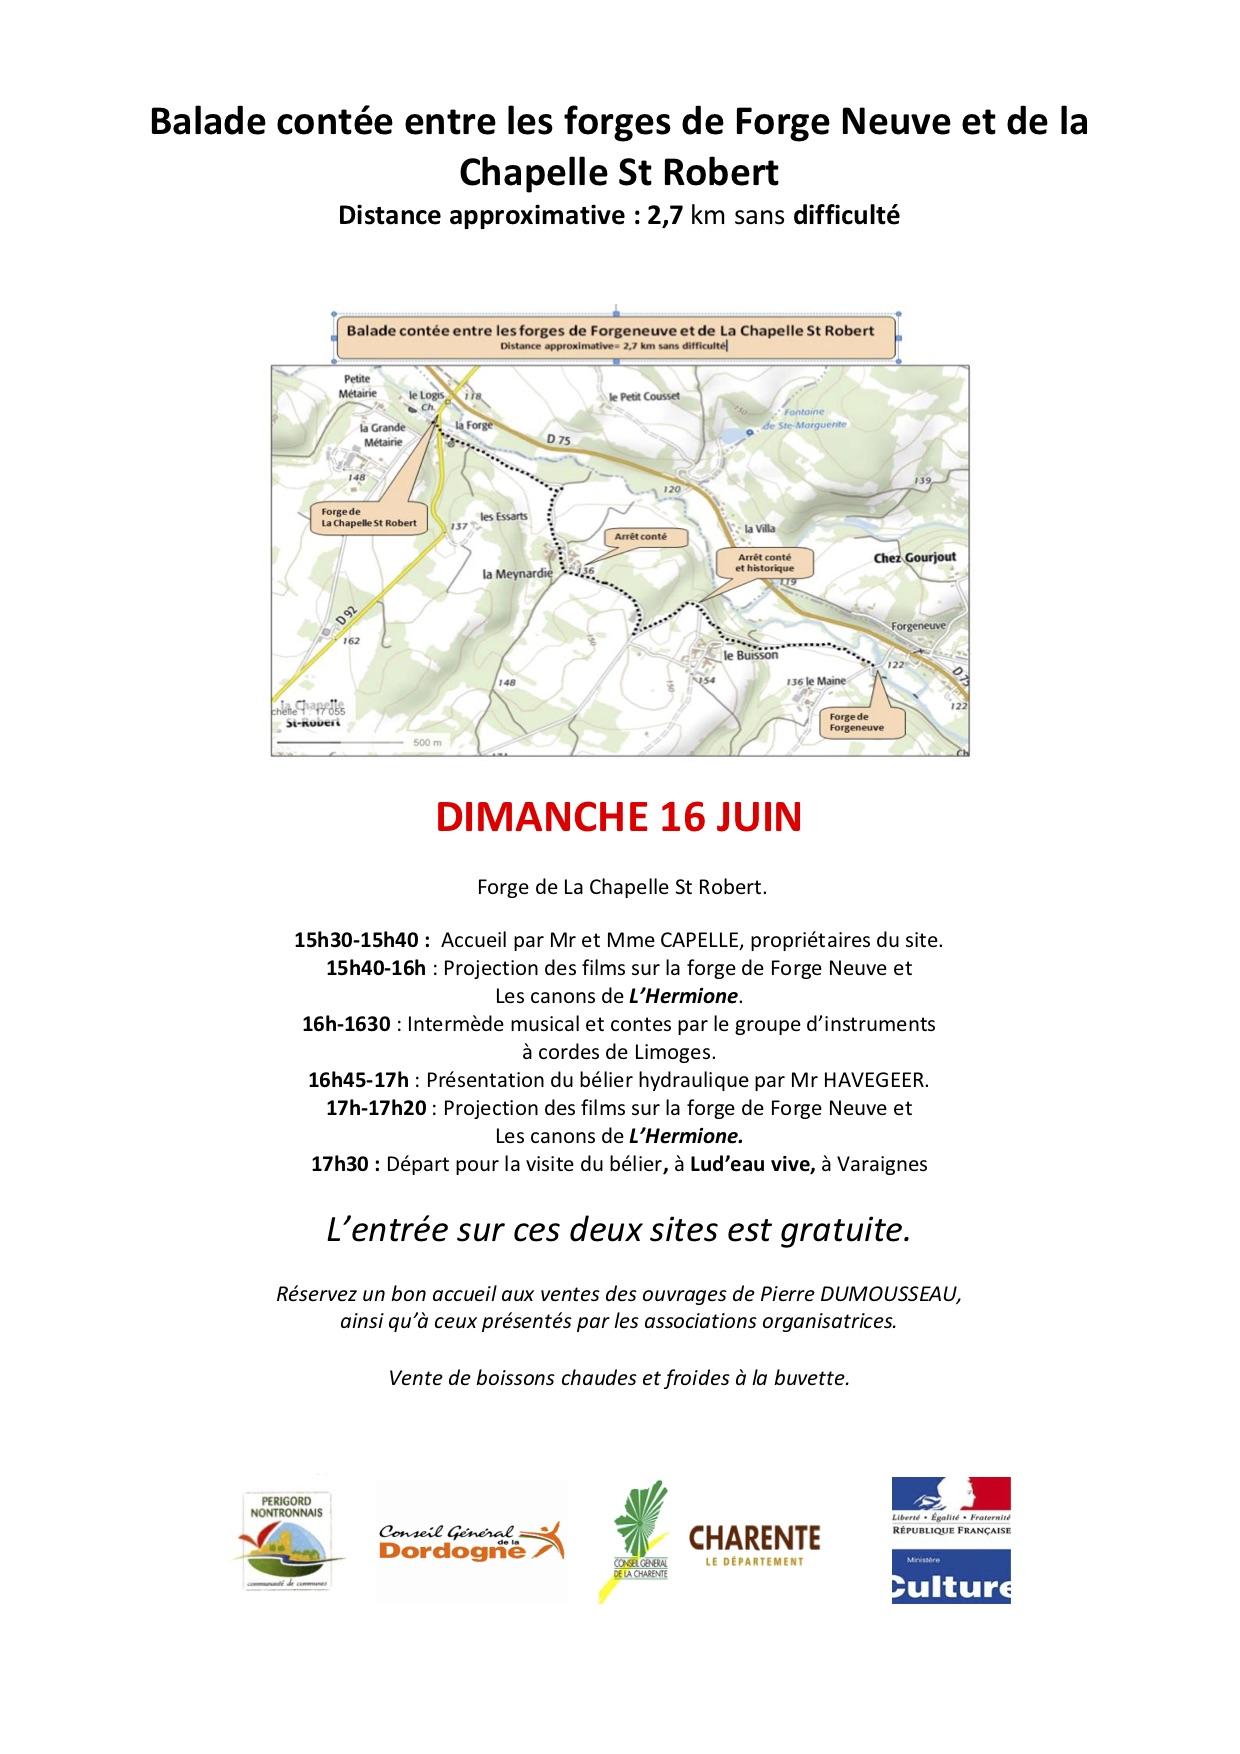 Invitation La ronde des forges 14-15 juin 2019-2.jpg